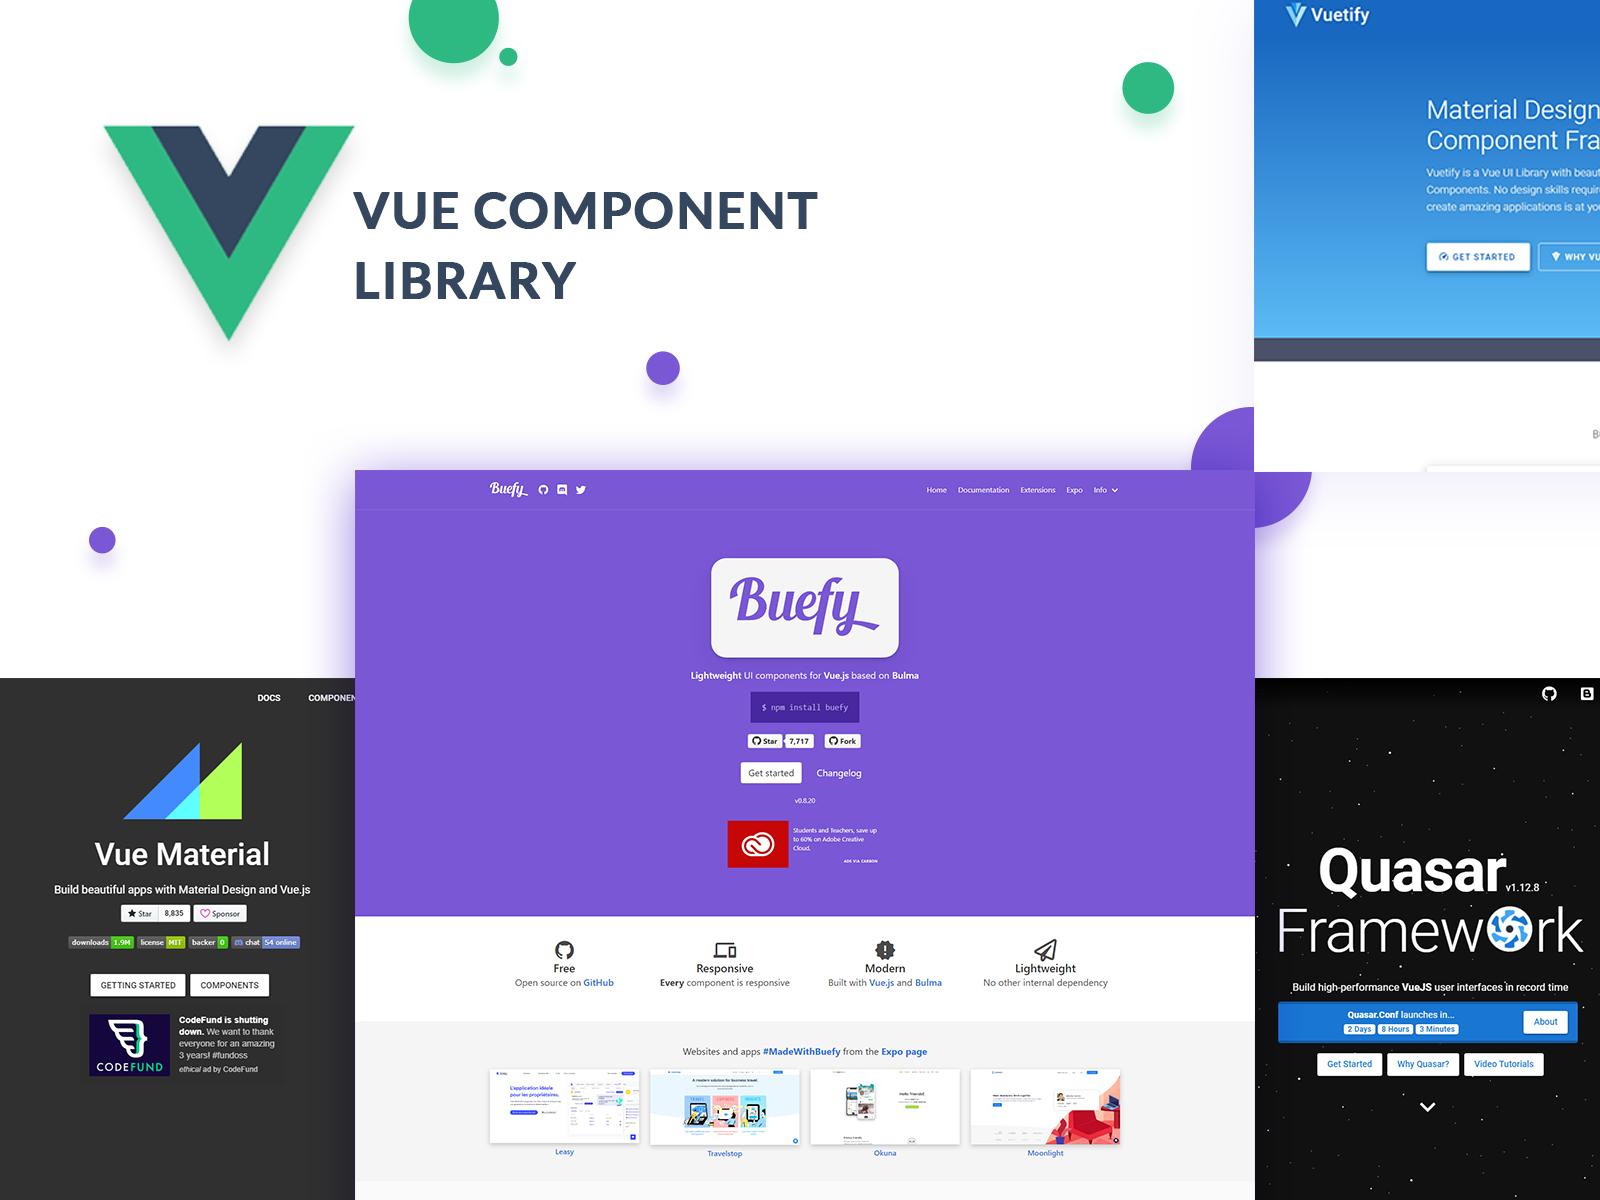 Vue component libraries